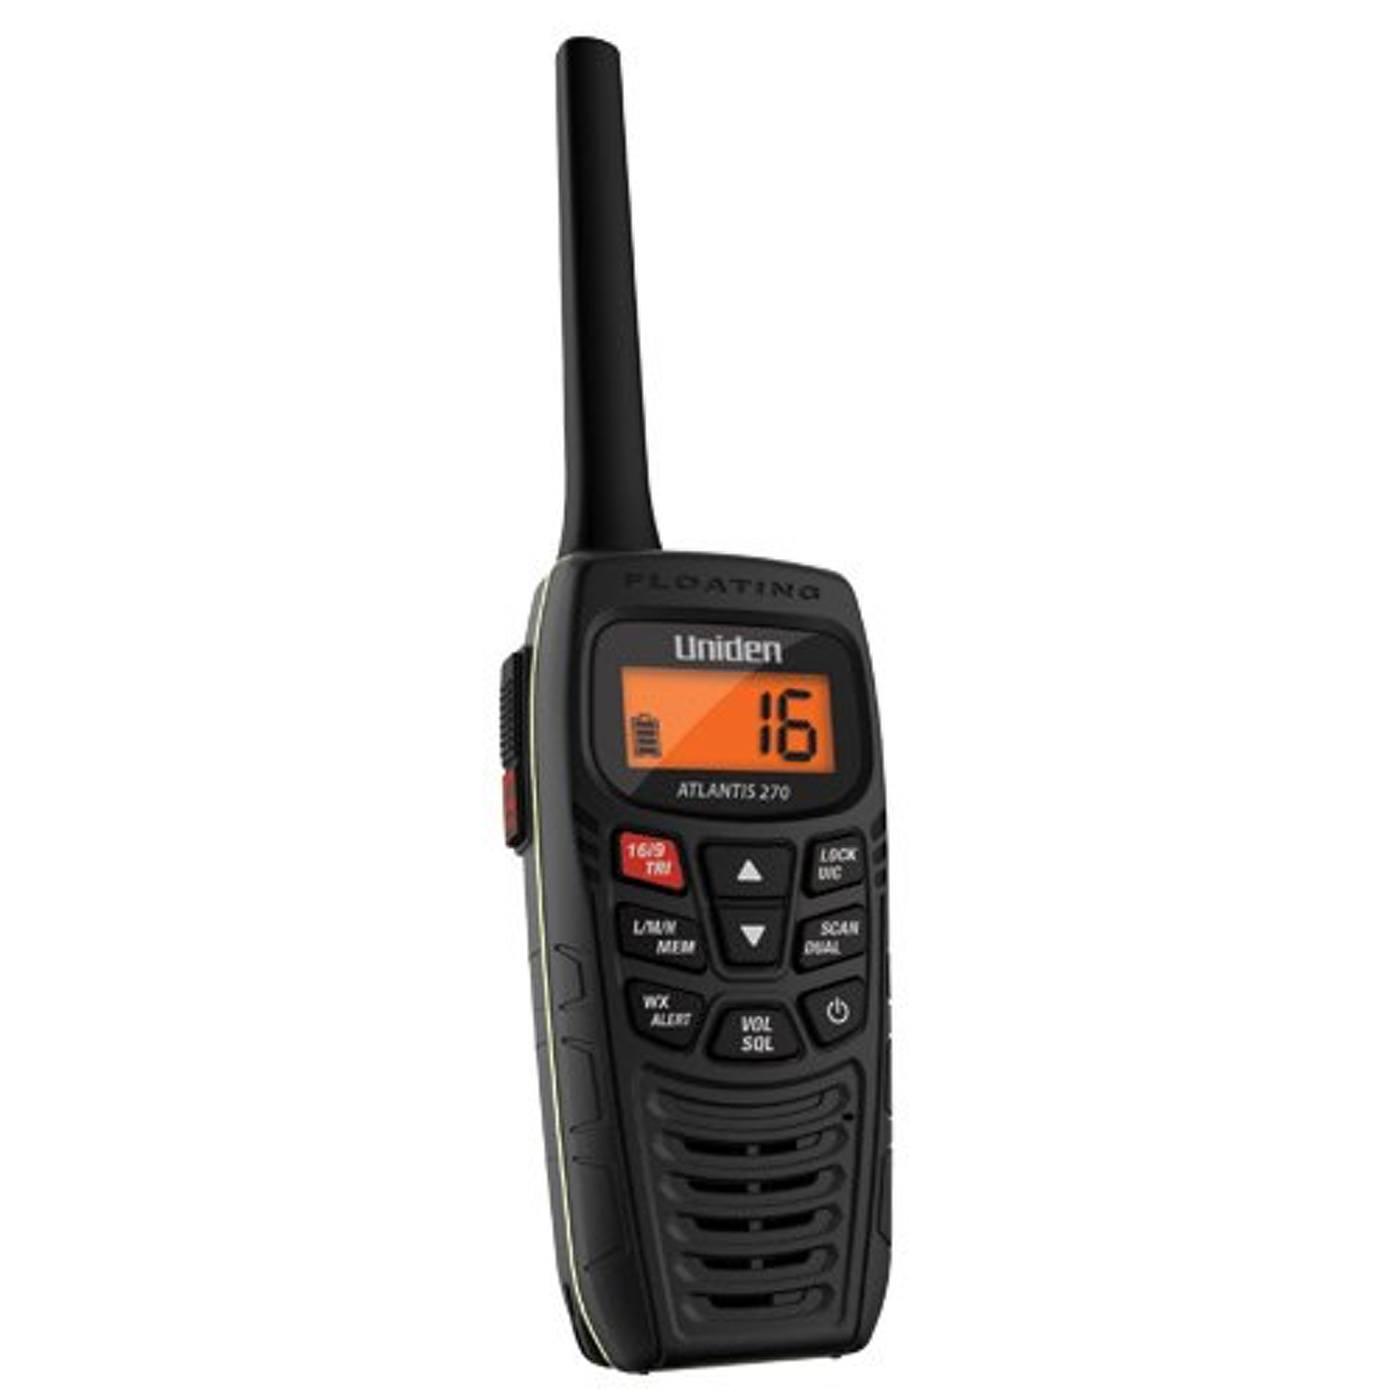 Uniden Atlantis 270 marine radio